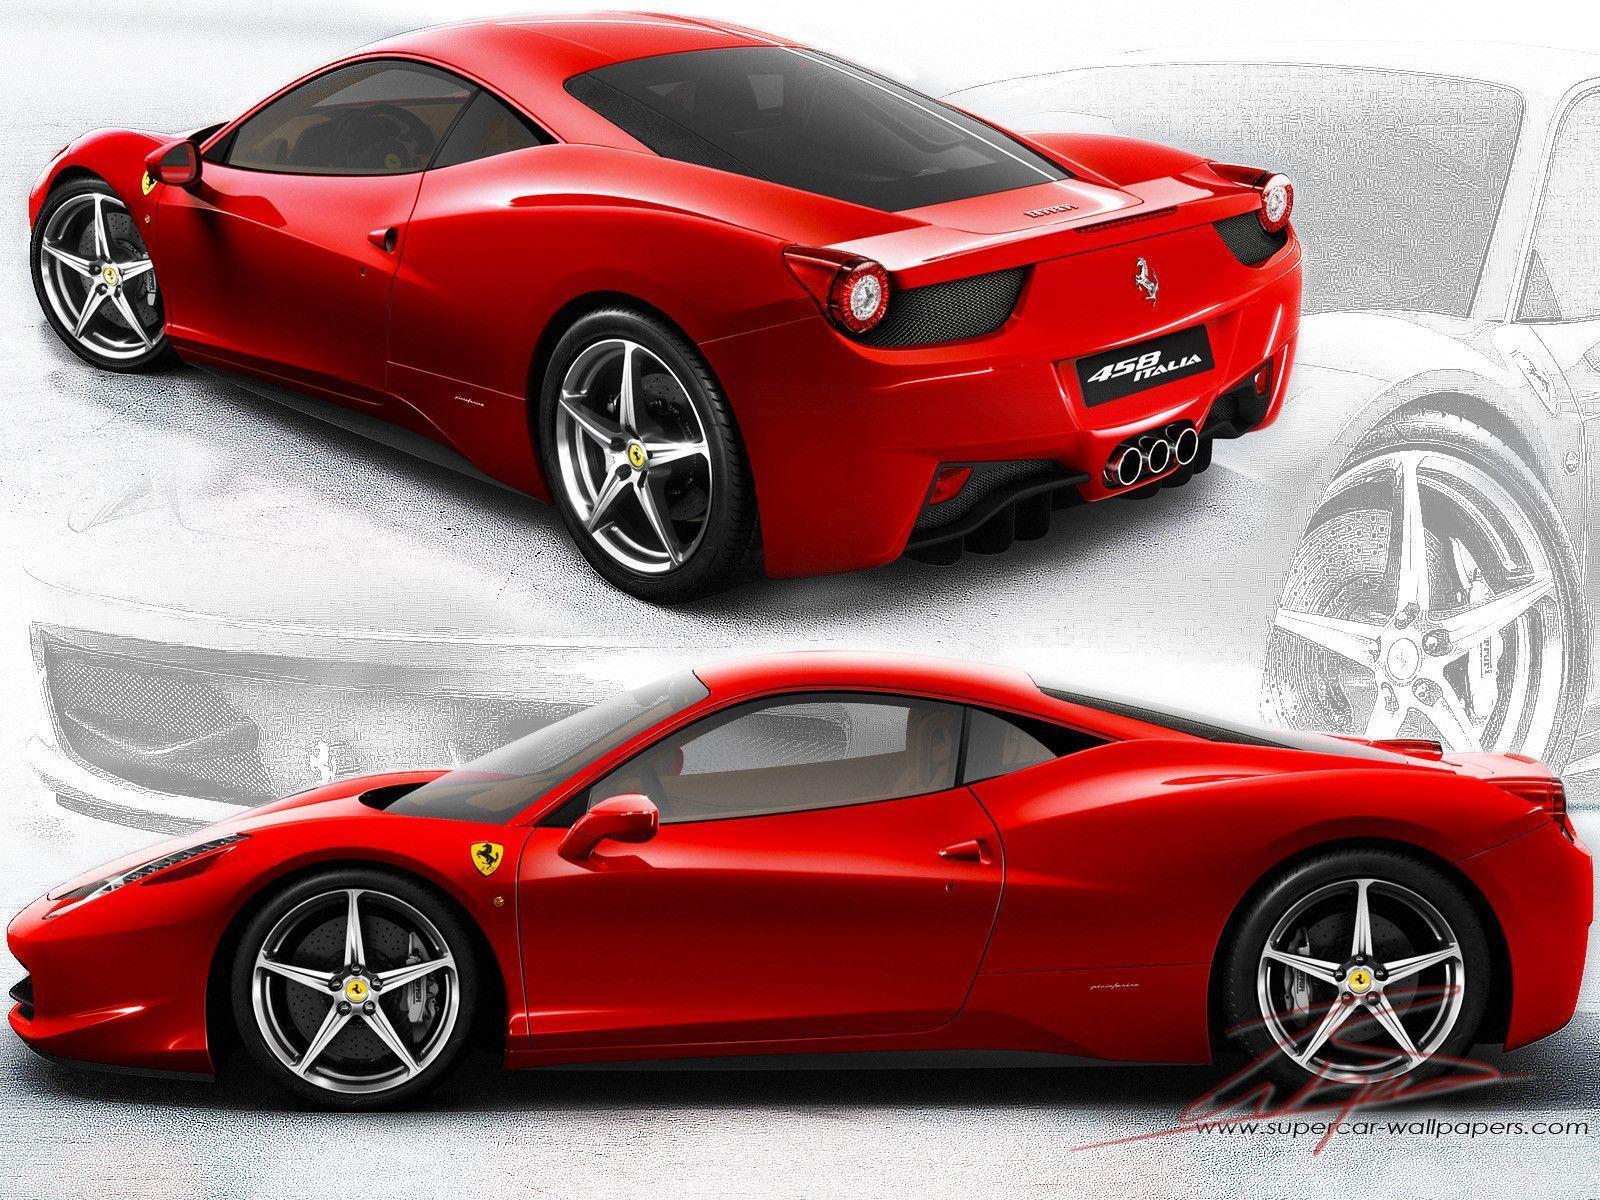 Ferrari 458 Italia Wallpapers Widescreen 1600x1200